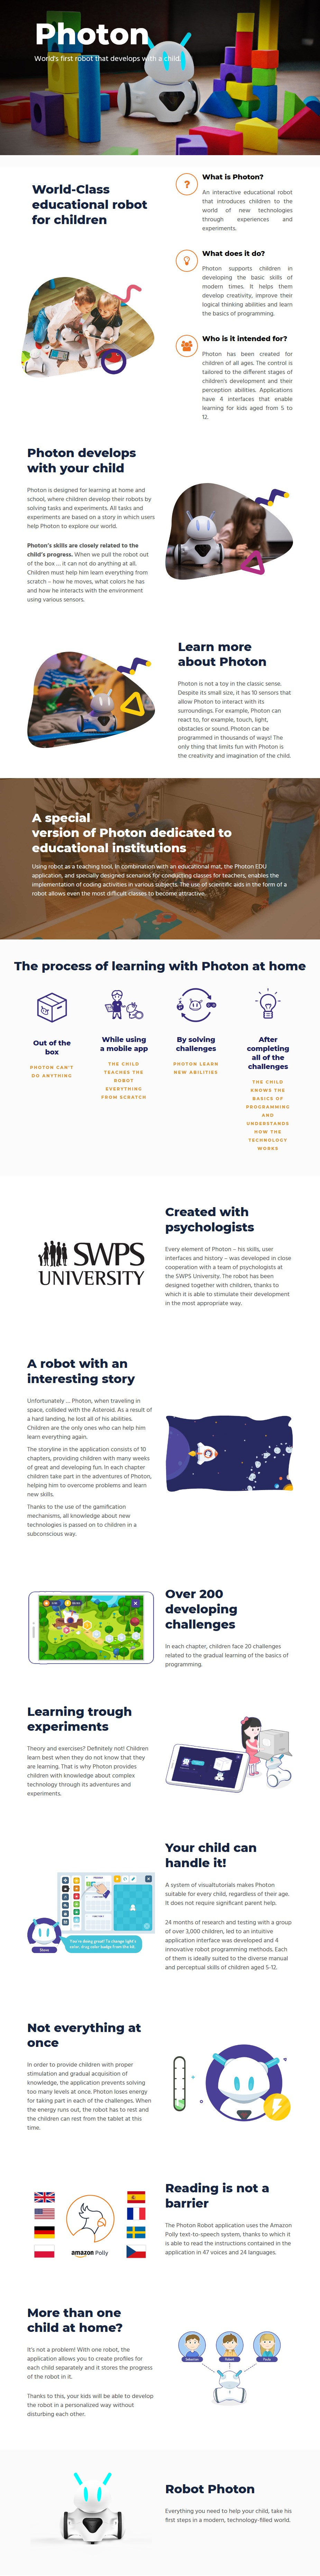 Photon Robot - Desktop Overview 1